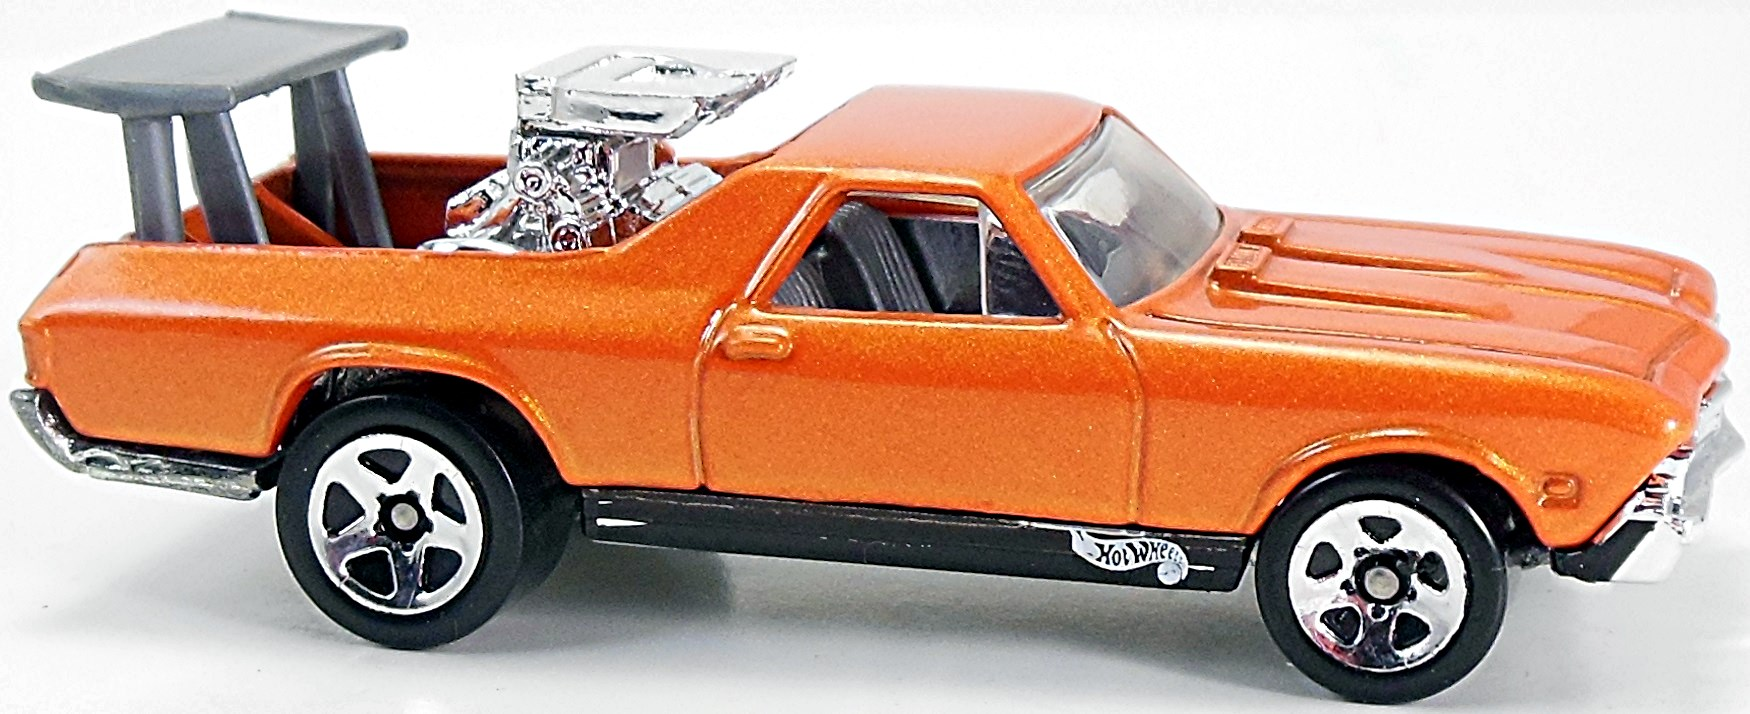 2000 Hot Wheels Truck Stoppers 1968 Chevrolet El Camino